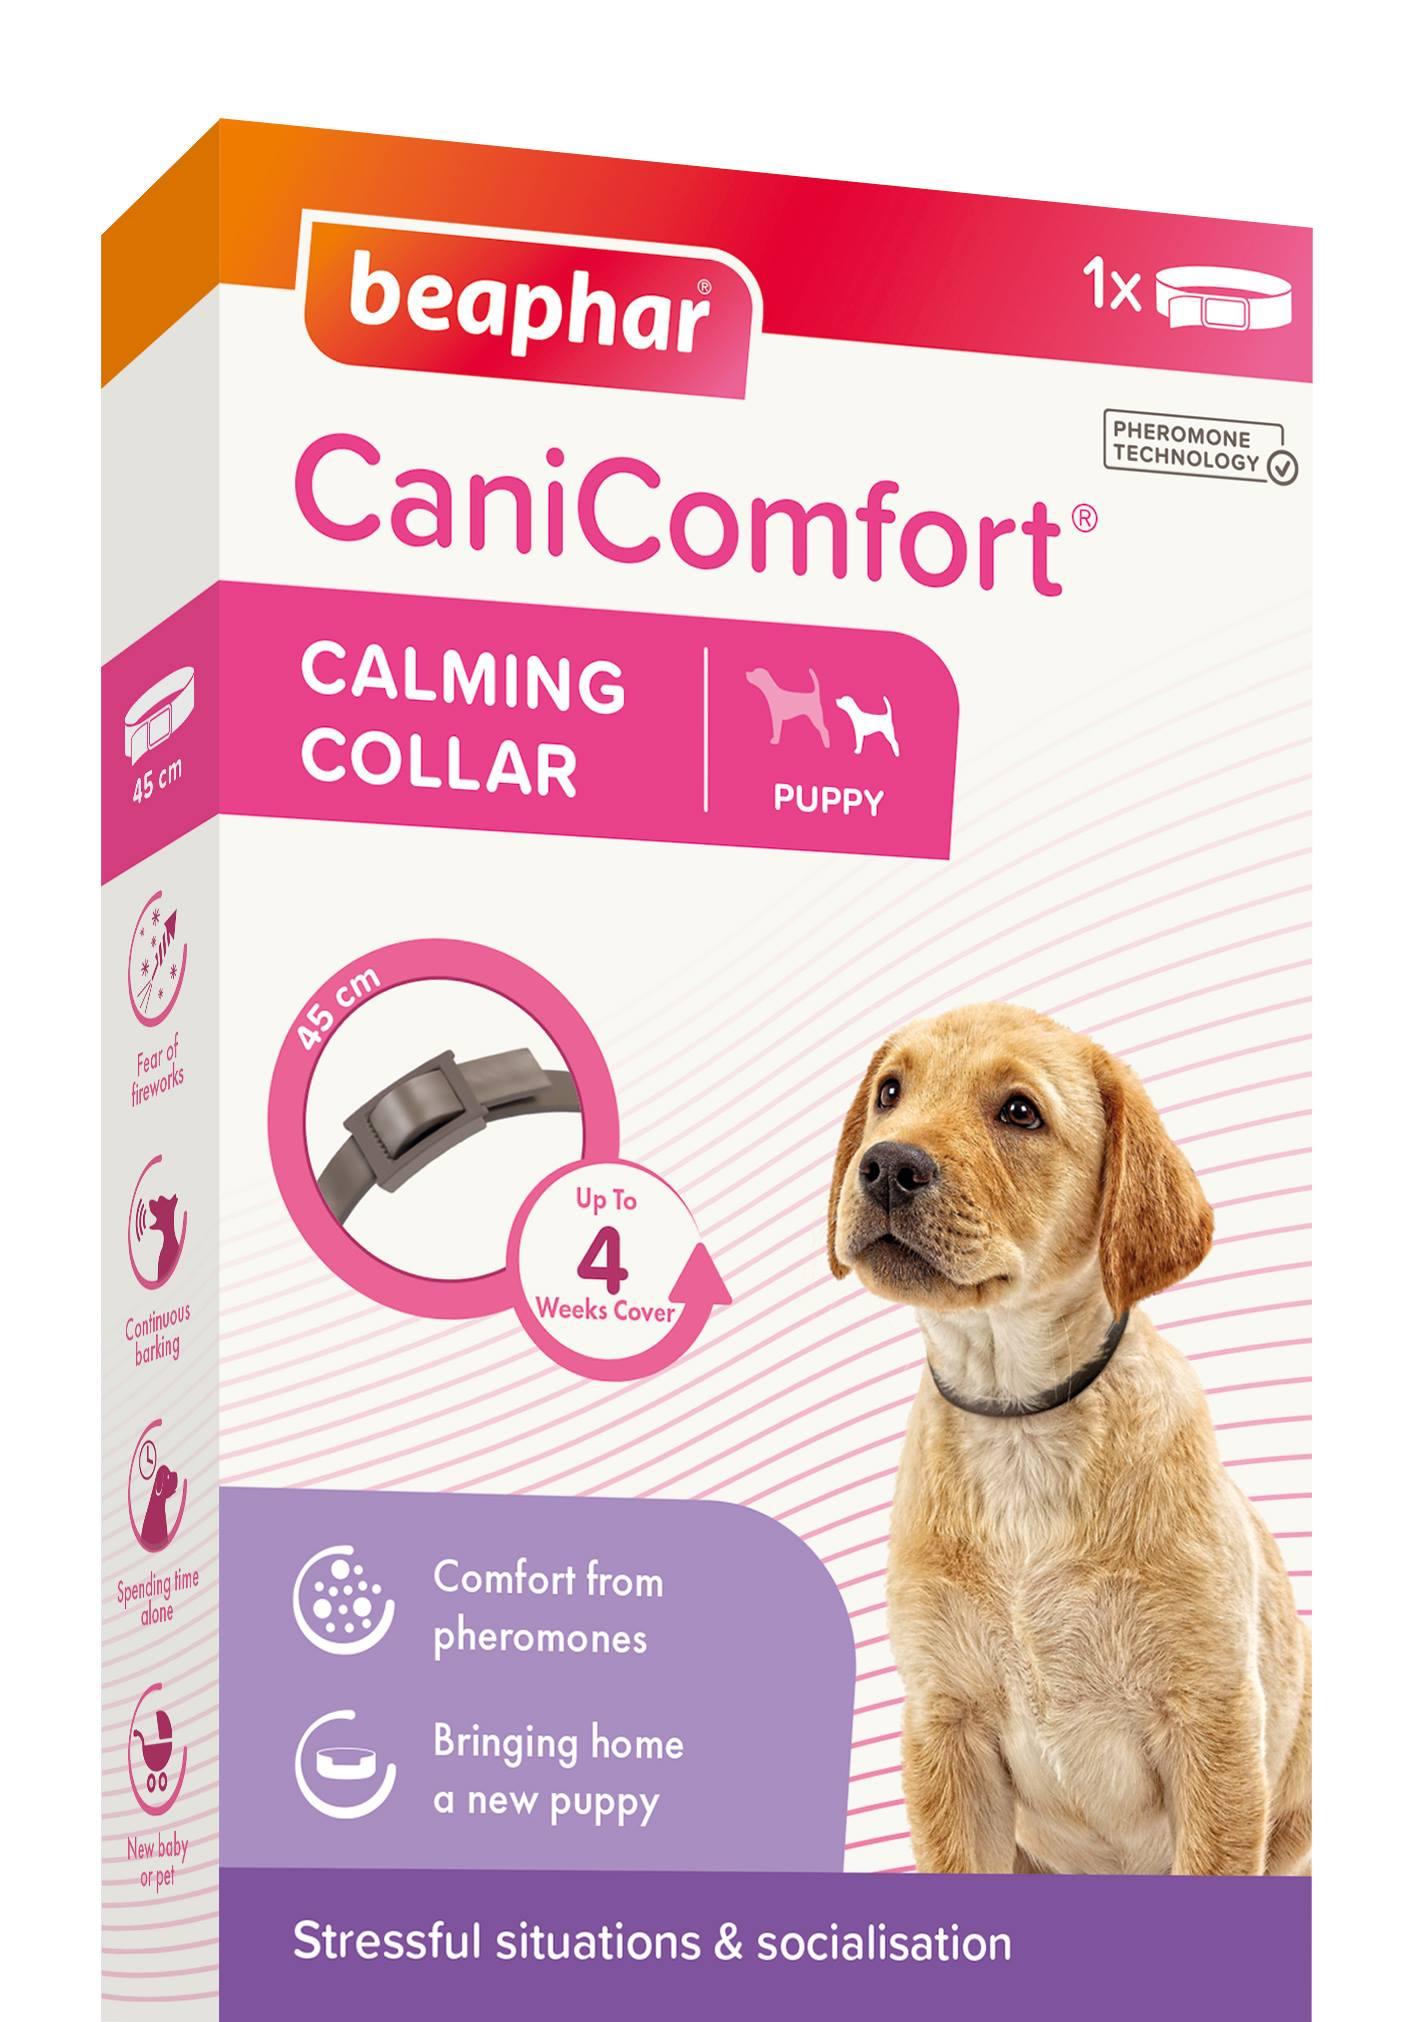 Beaphar CaniComfort Collar Puppy 45cm Hund